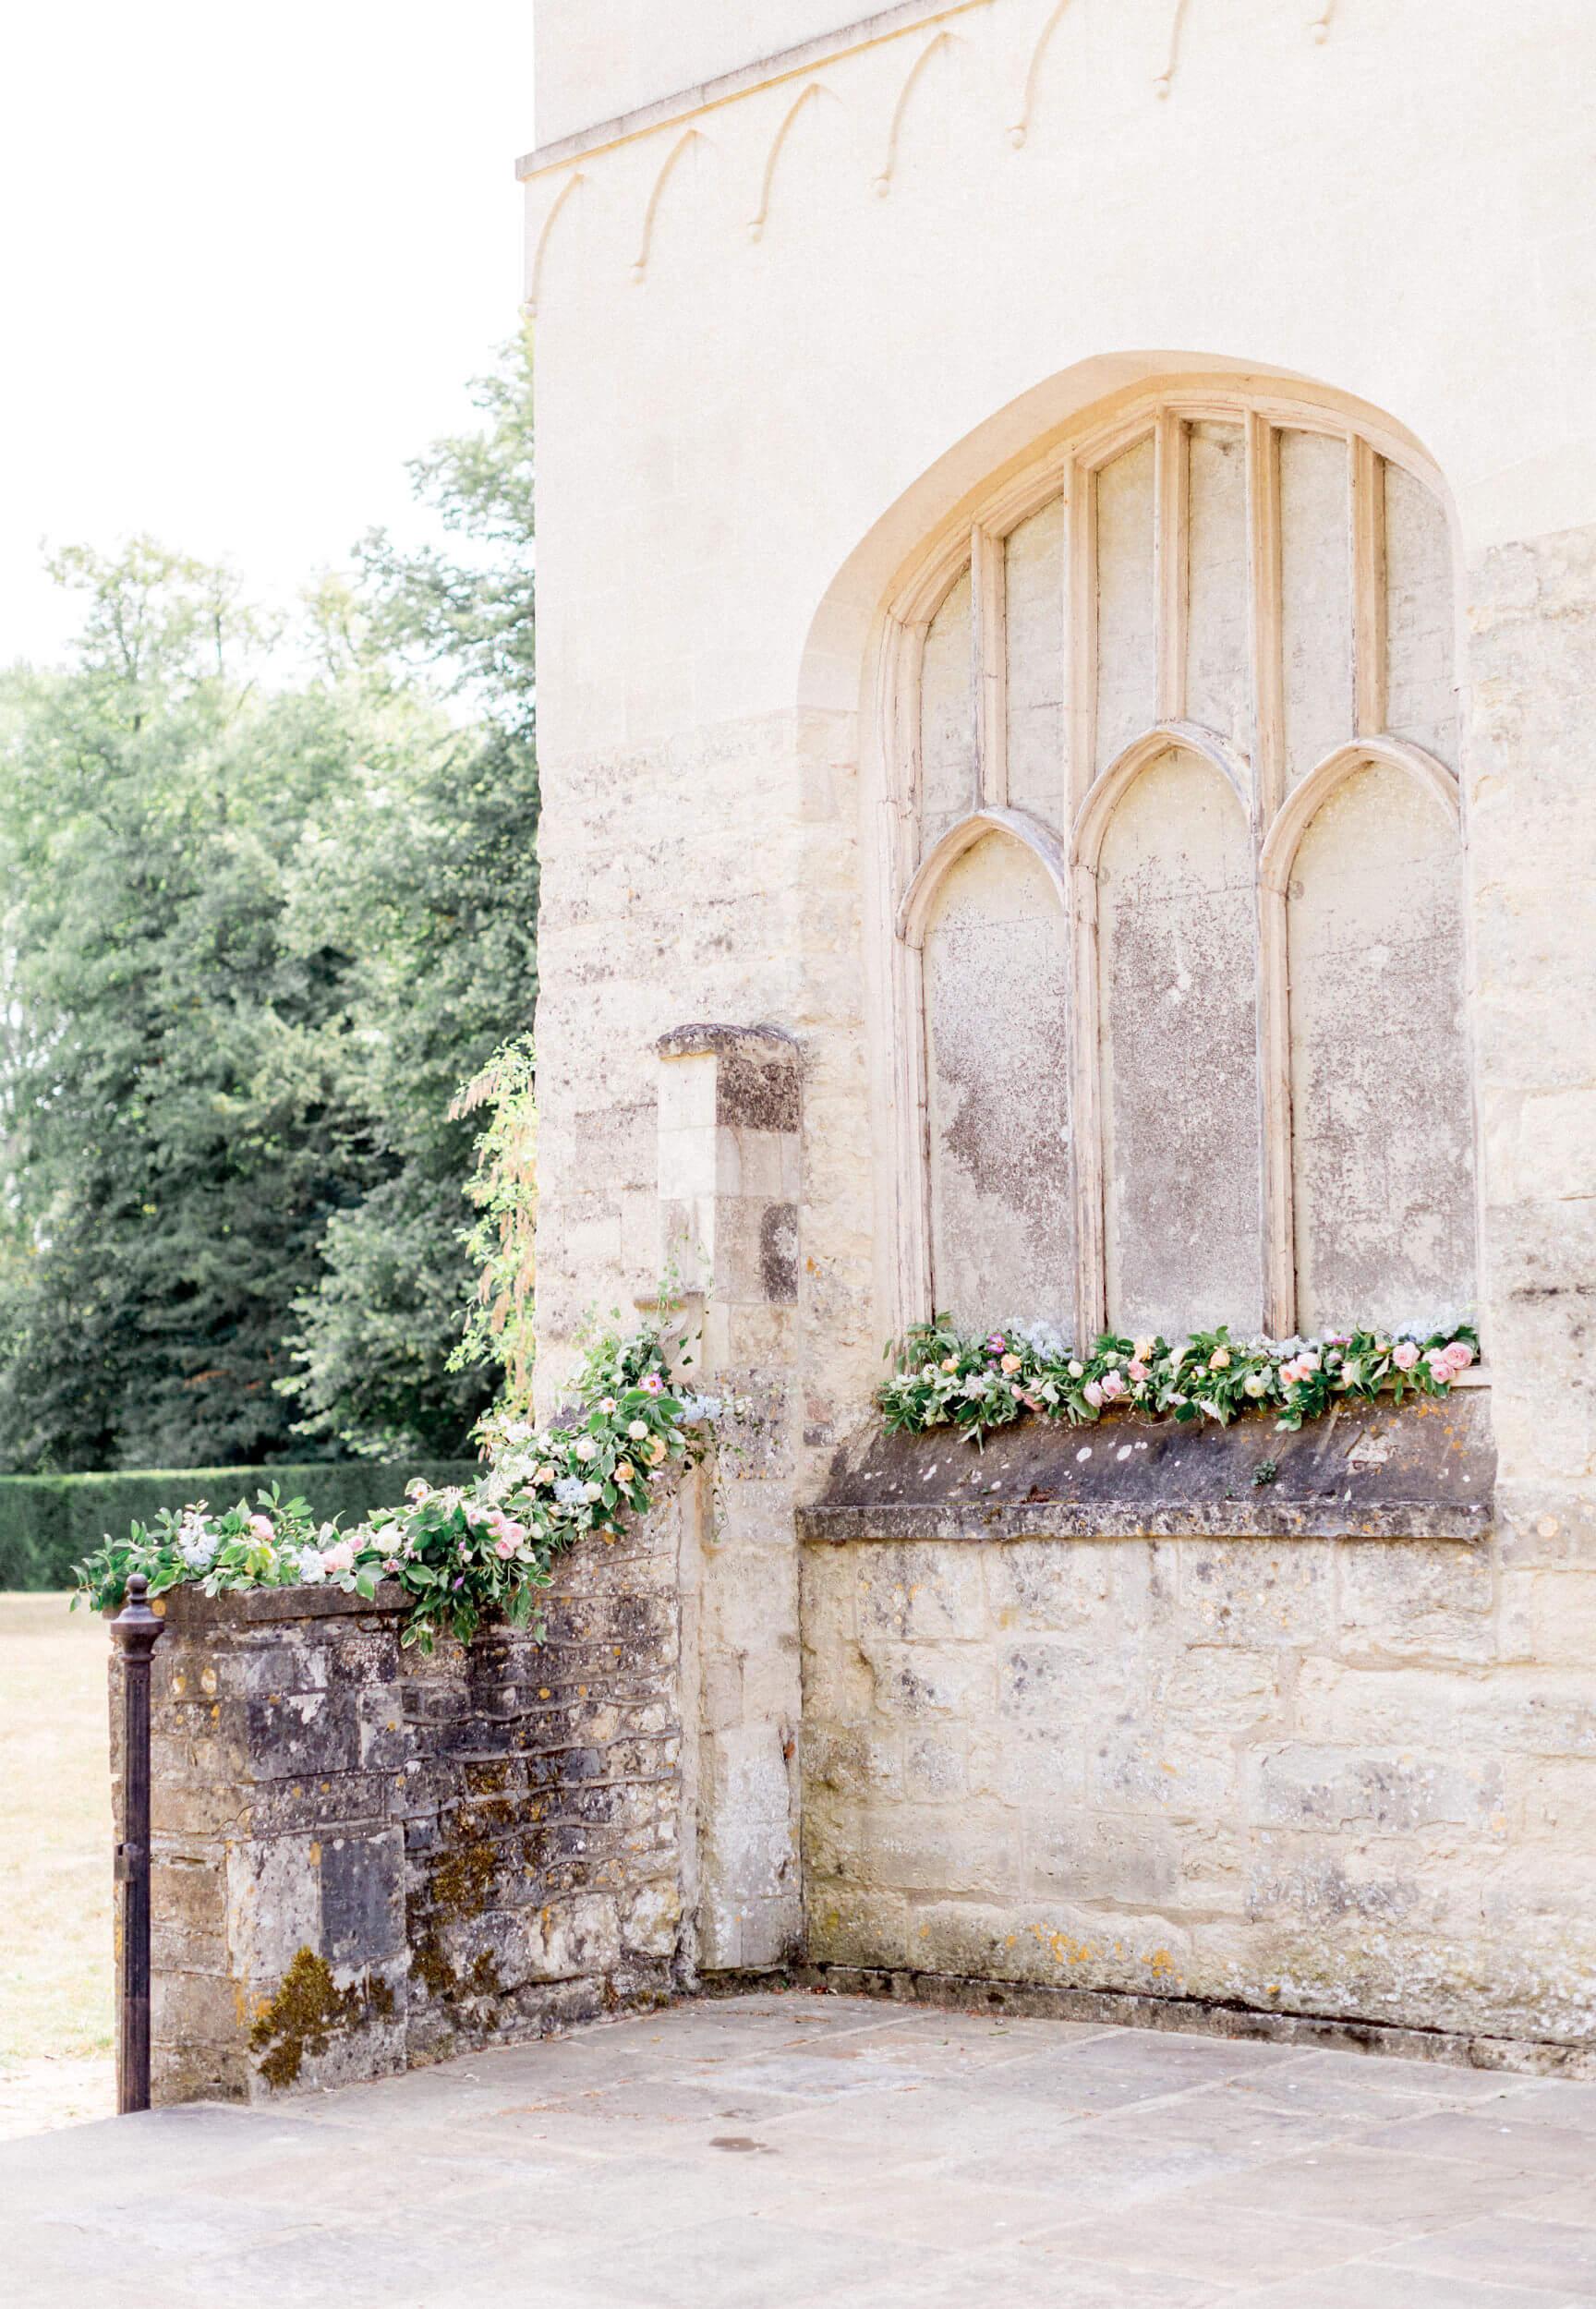 Nether Winchendon House Flower Courtyard